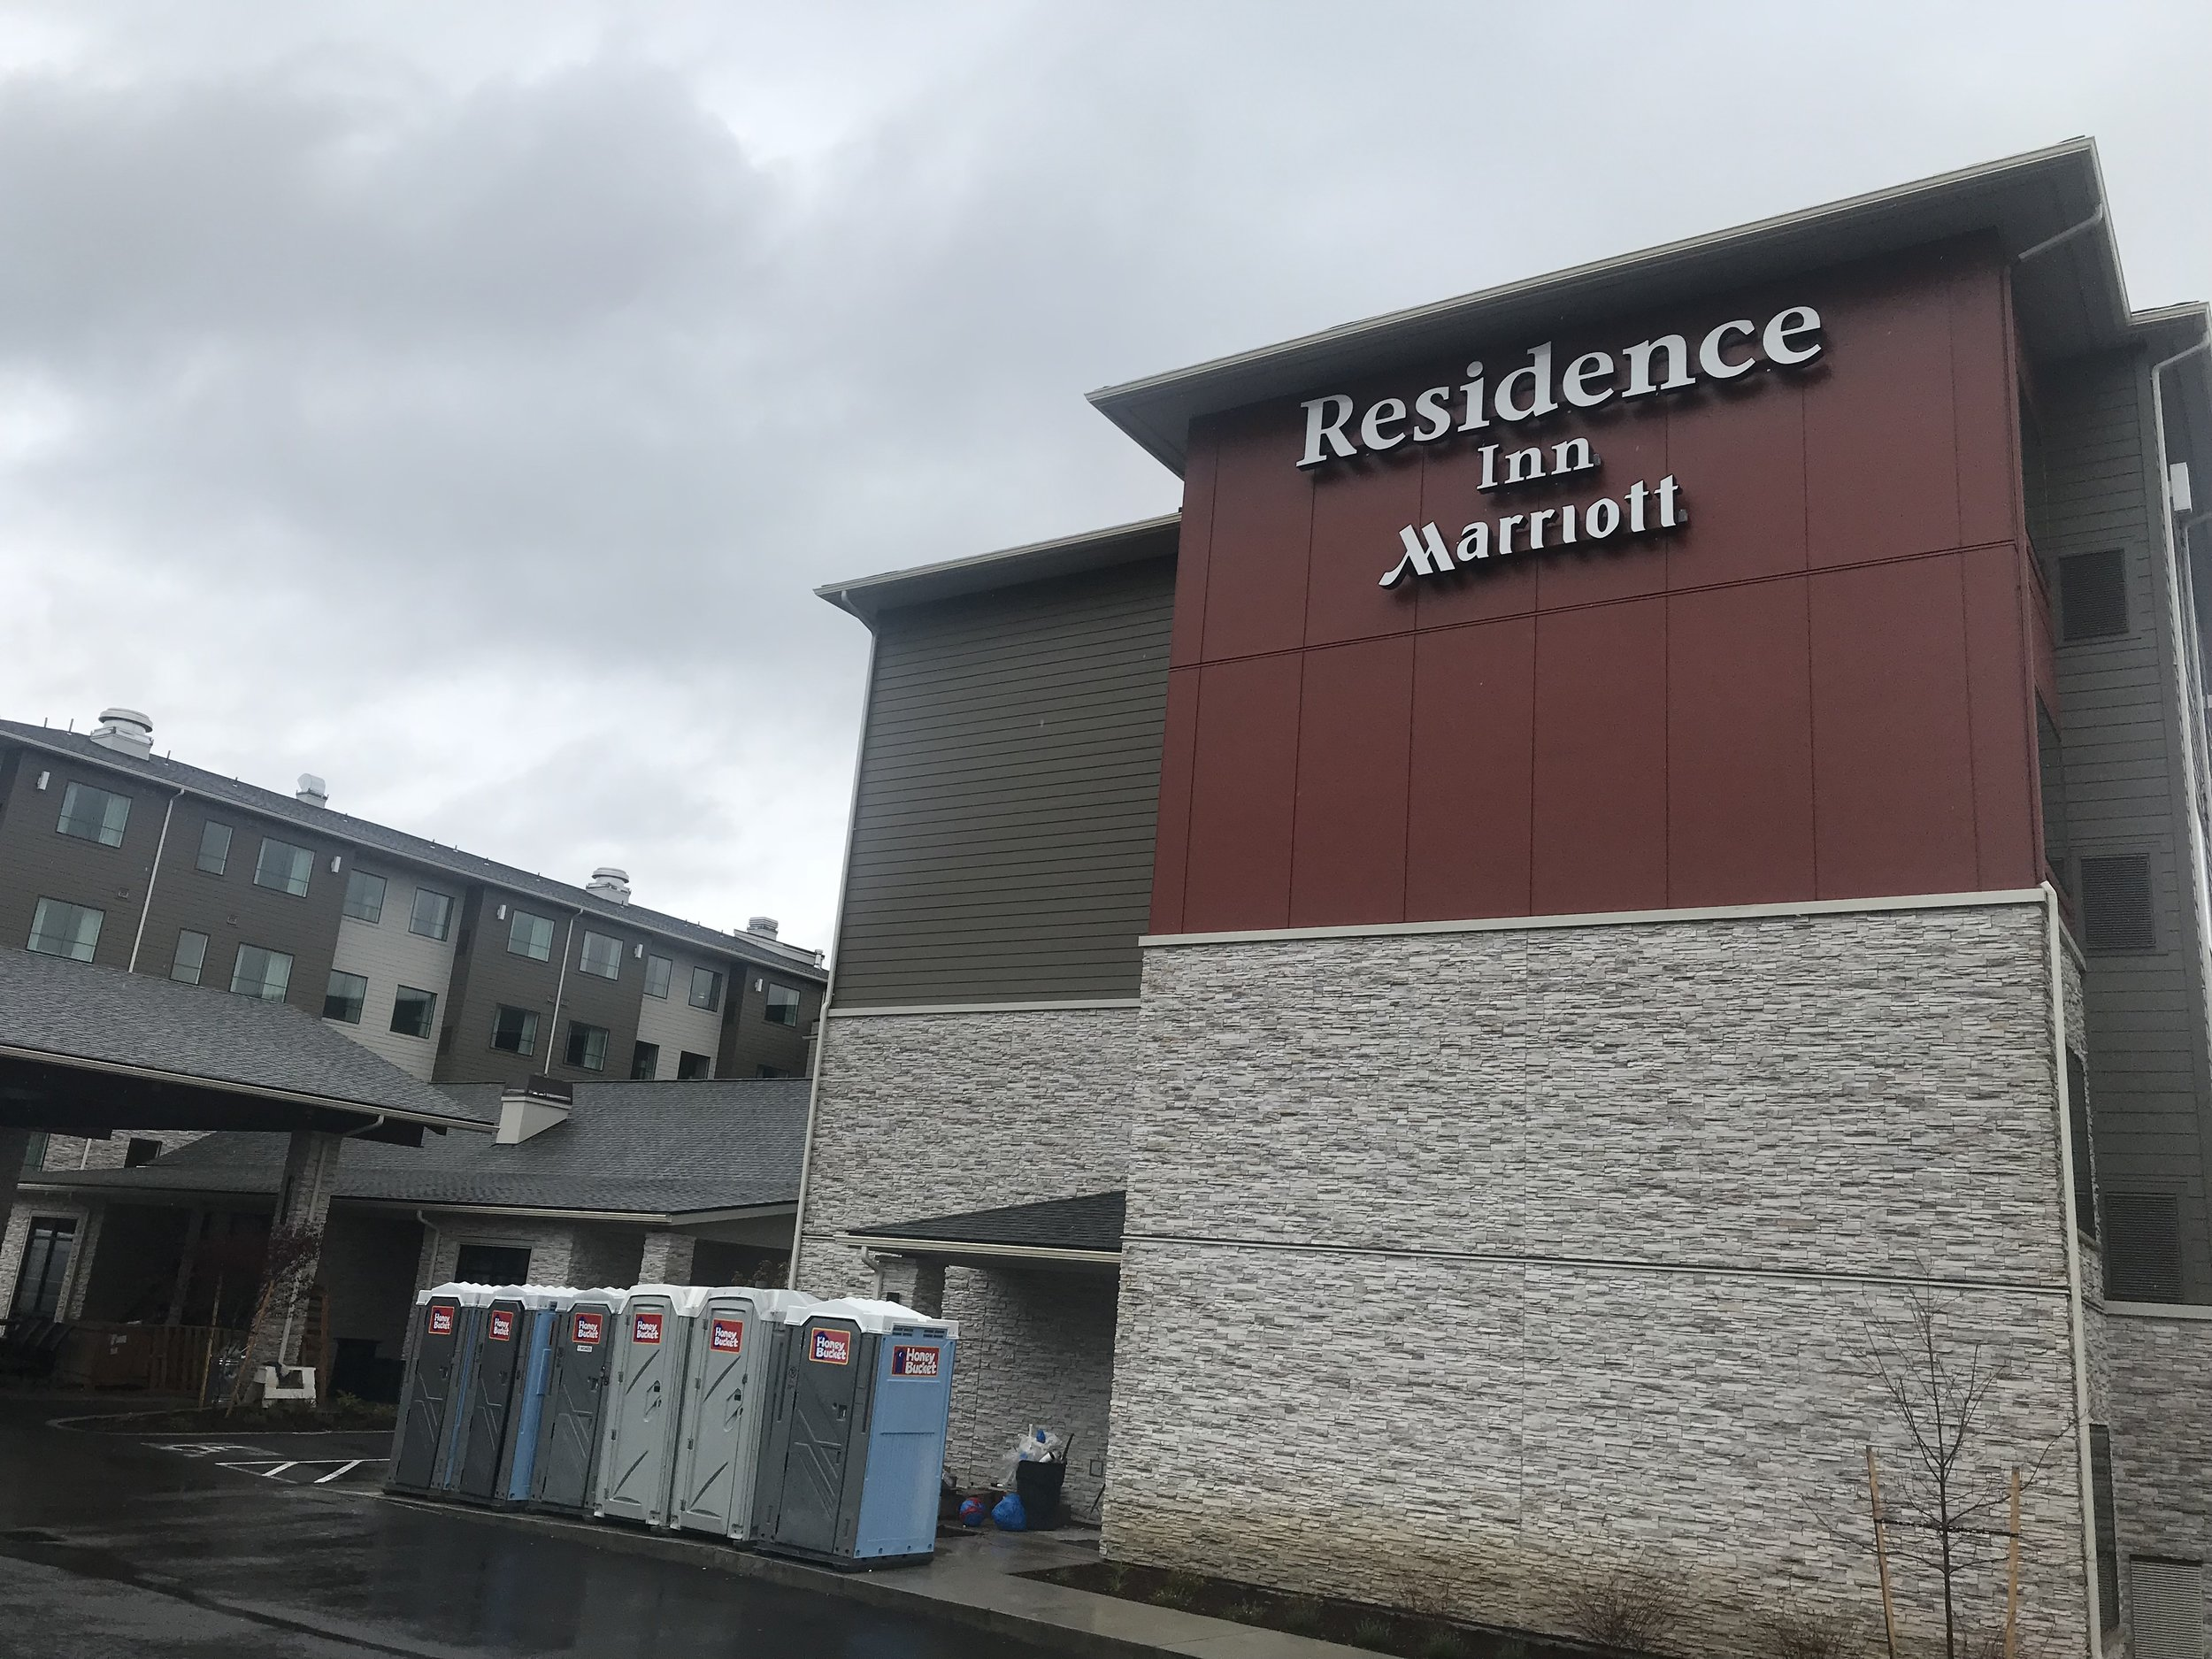 Marriott: Residence inn Sea-Tac, WA